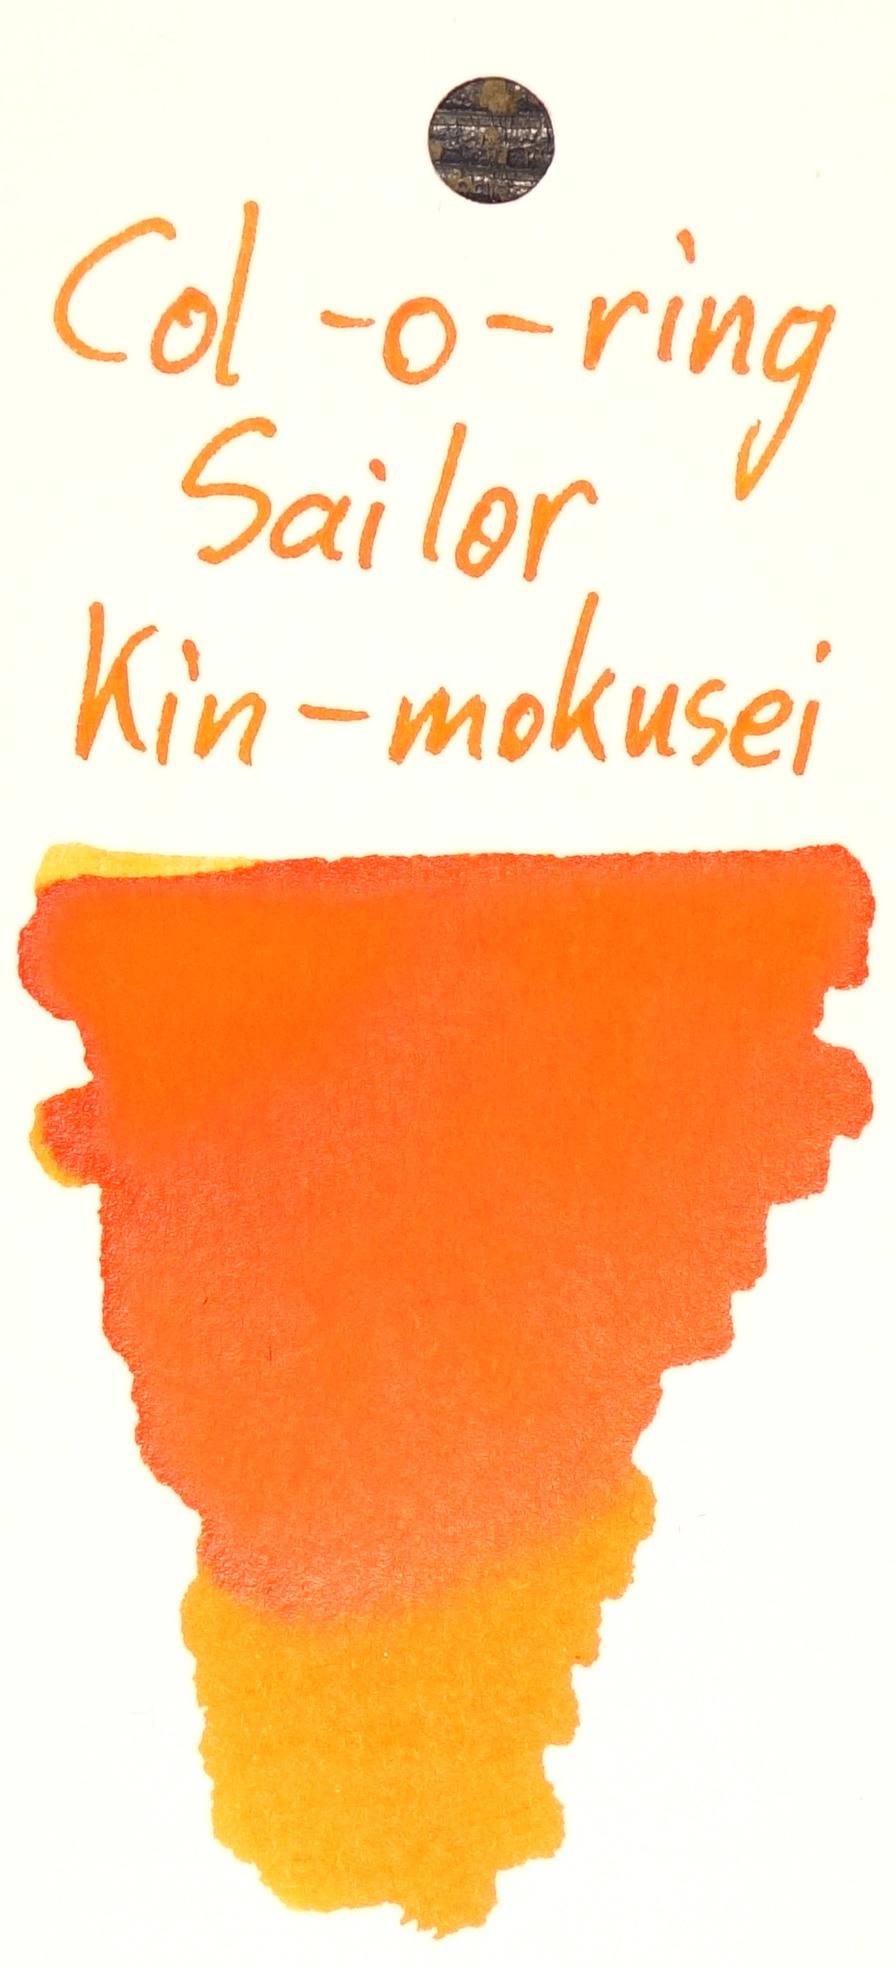 Sailor Kin-mokusei Col-o-ring.JPG